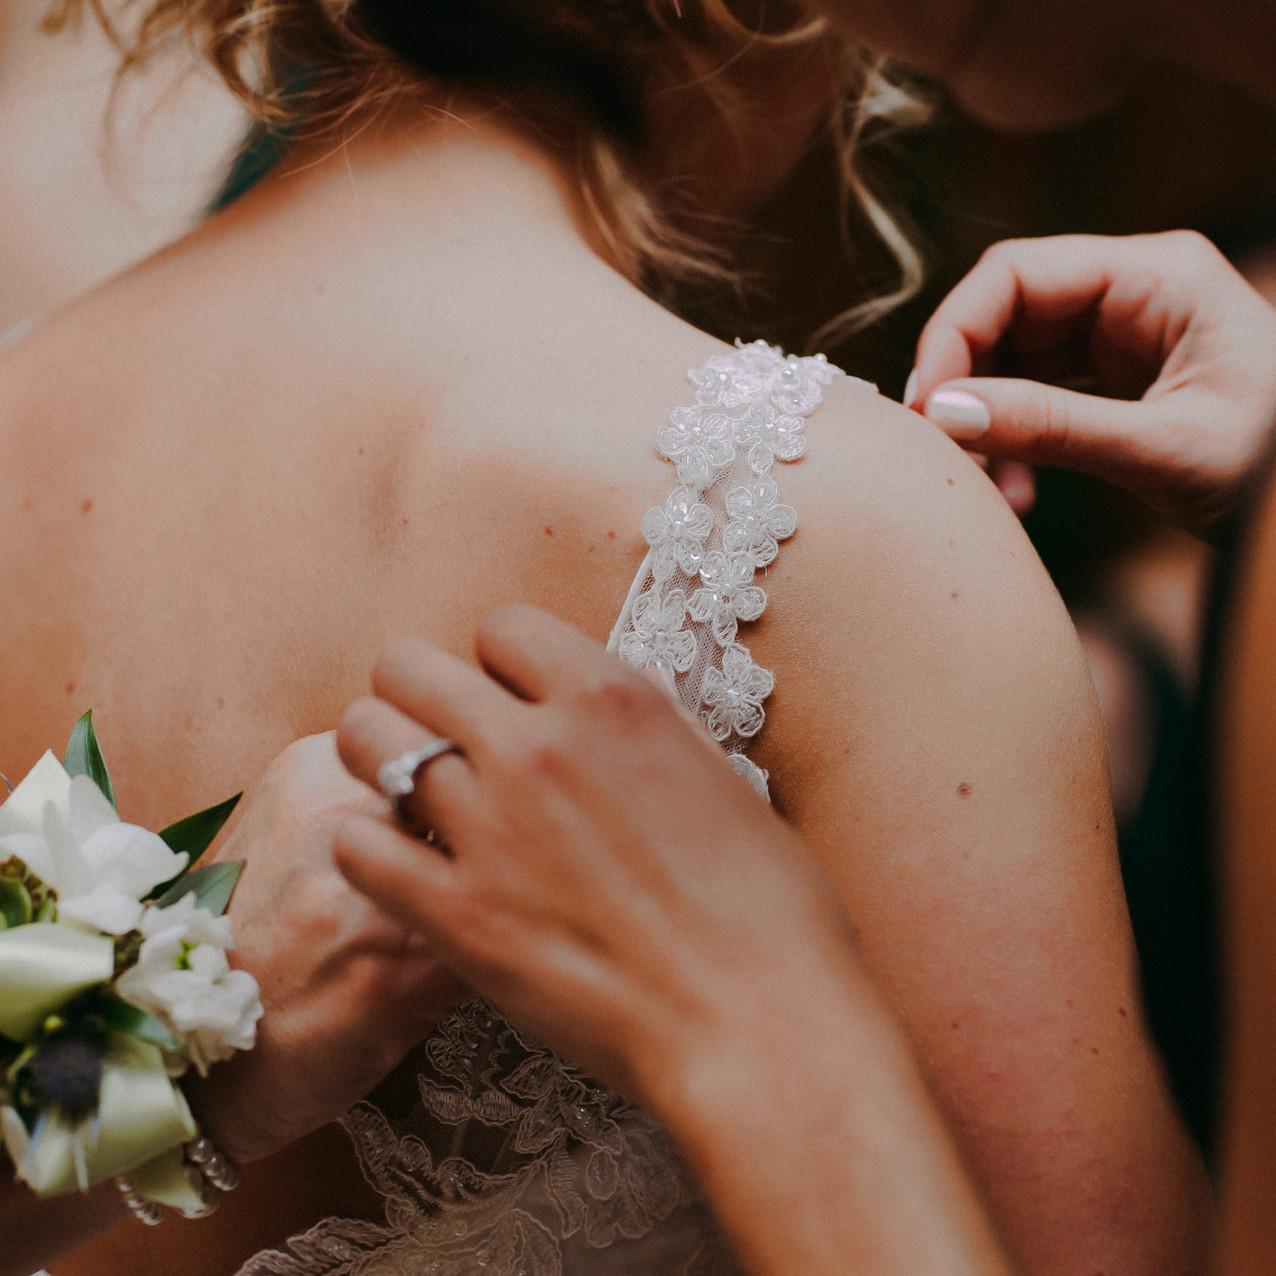 Women adjust the lace strap on a bride's dress